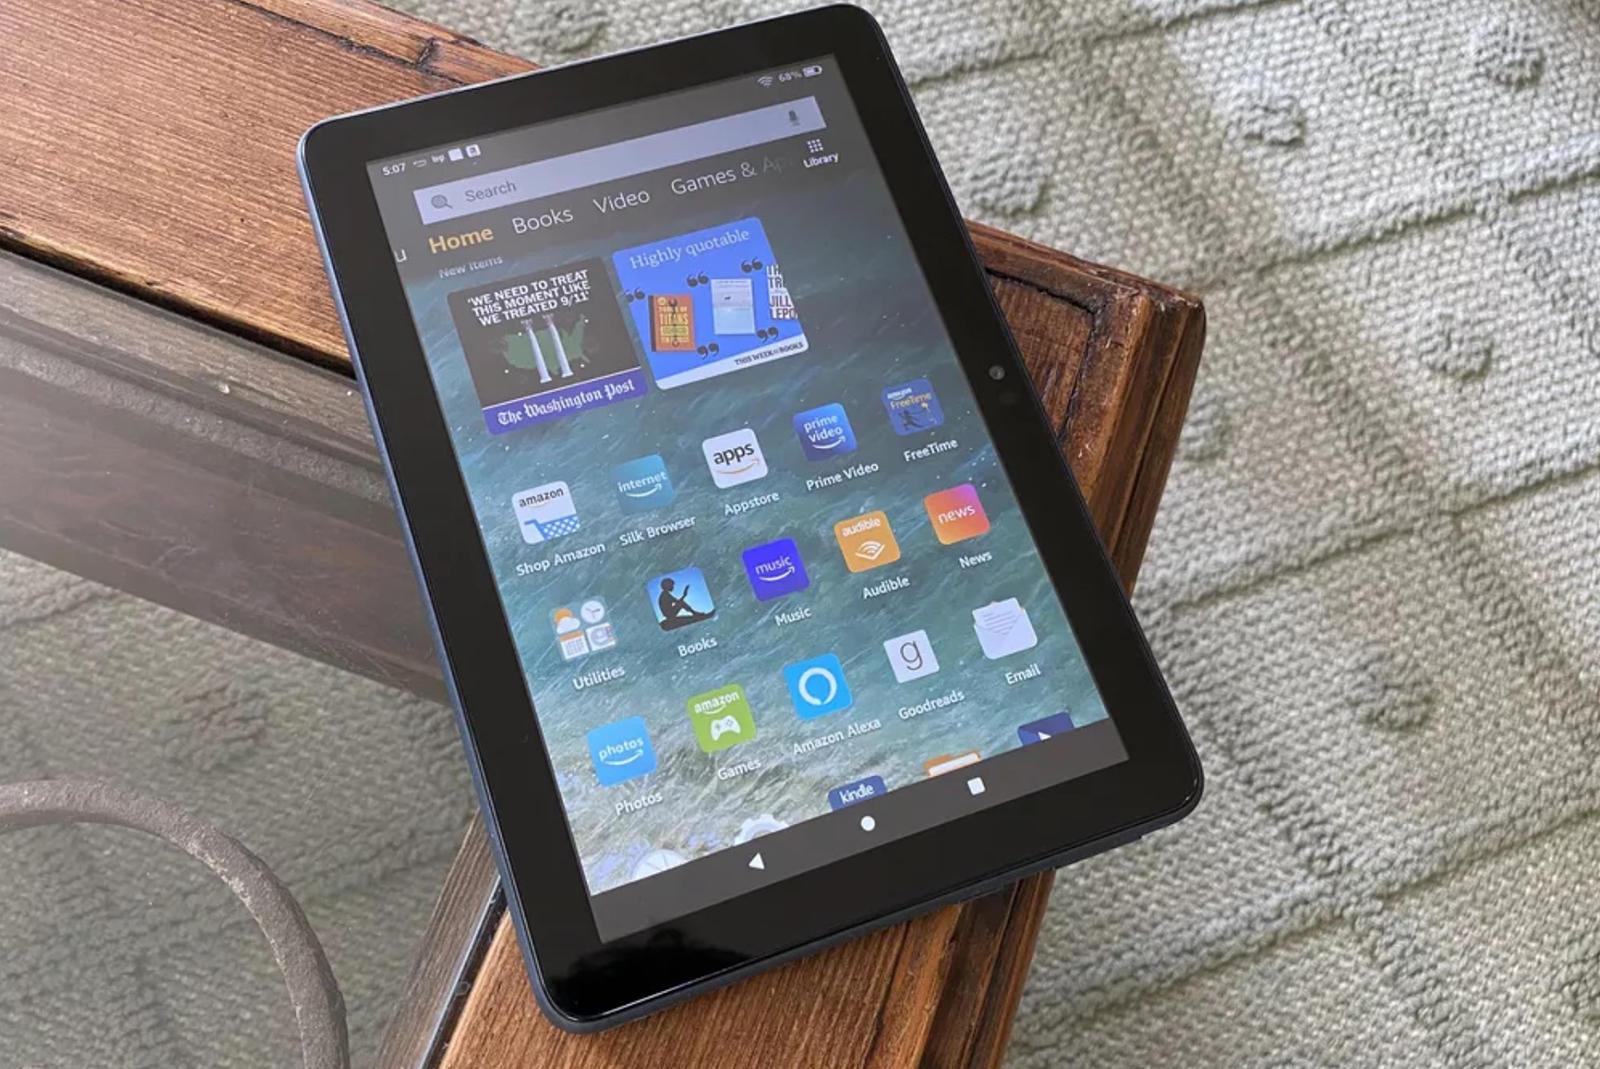 best-amazon-tablet-amazon-fire-hd-8-plus-review.jpg